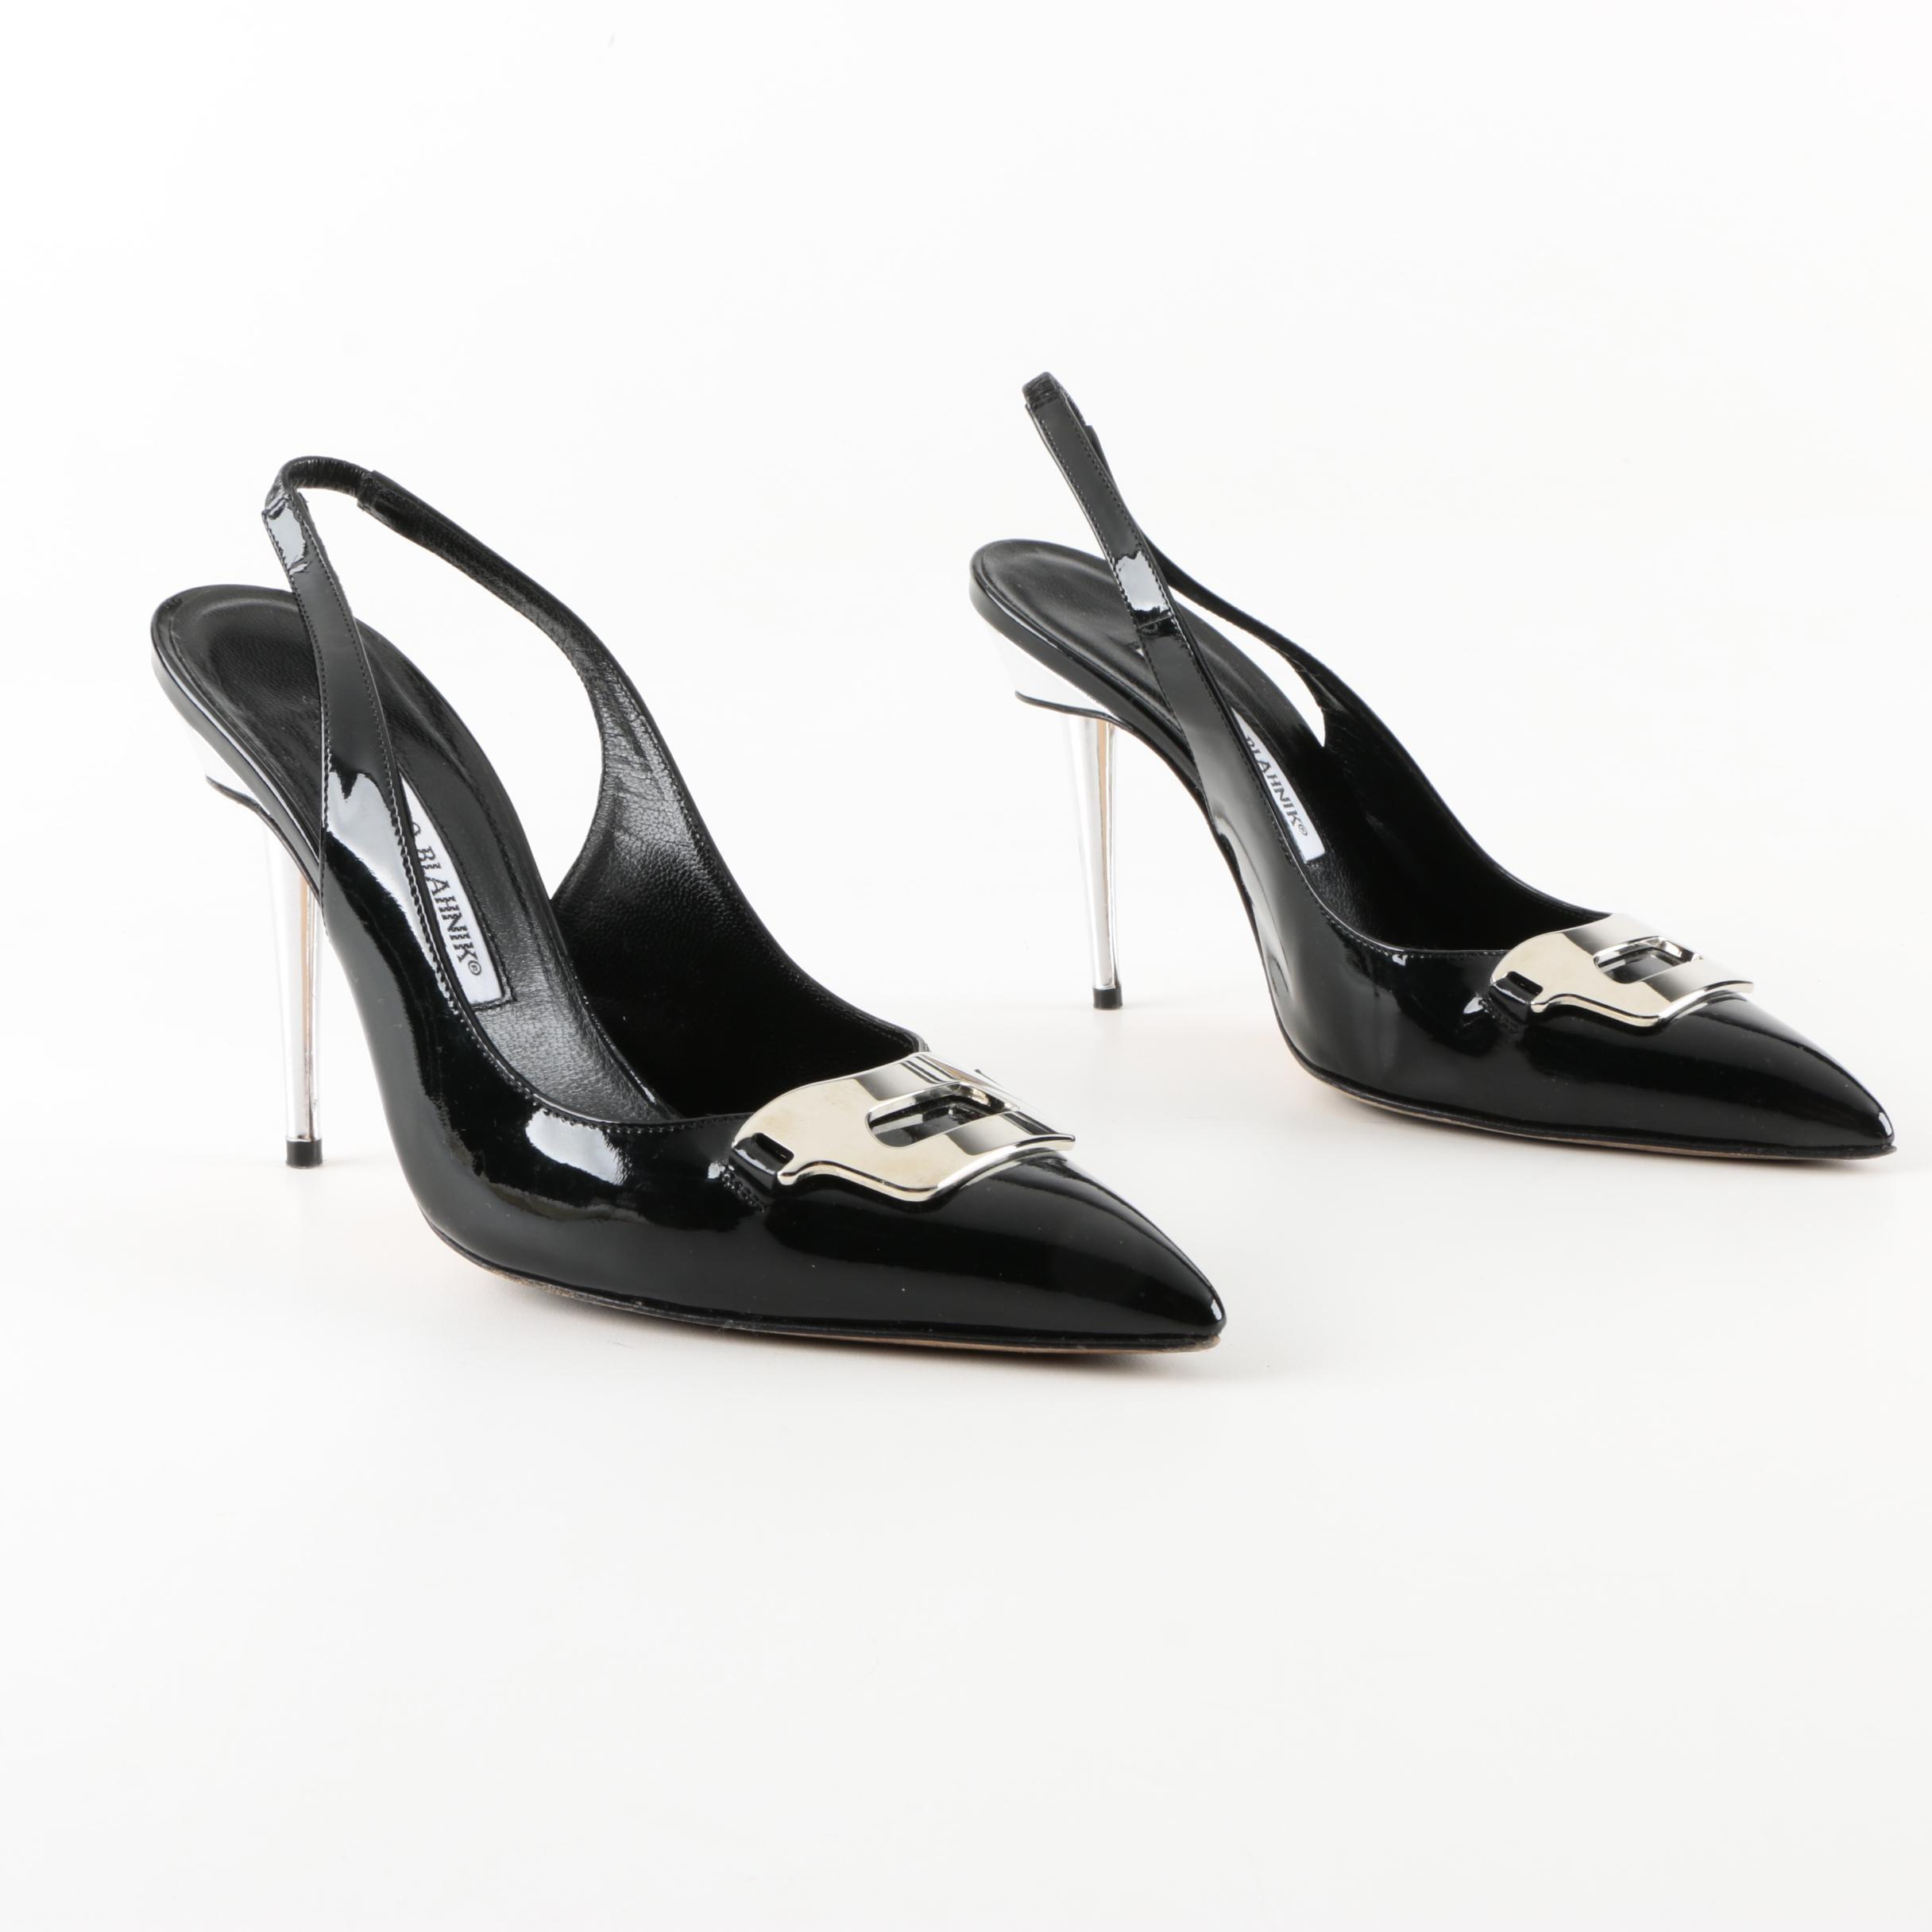 Manolo Blahnik Black Patent Leather Buckle Slingback Heels